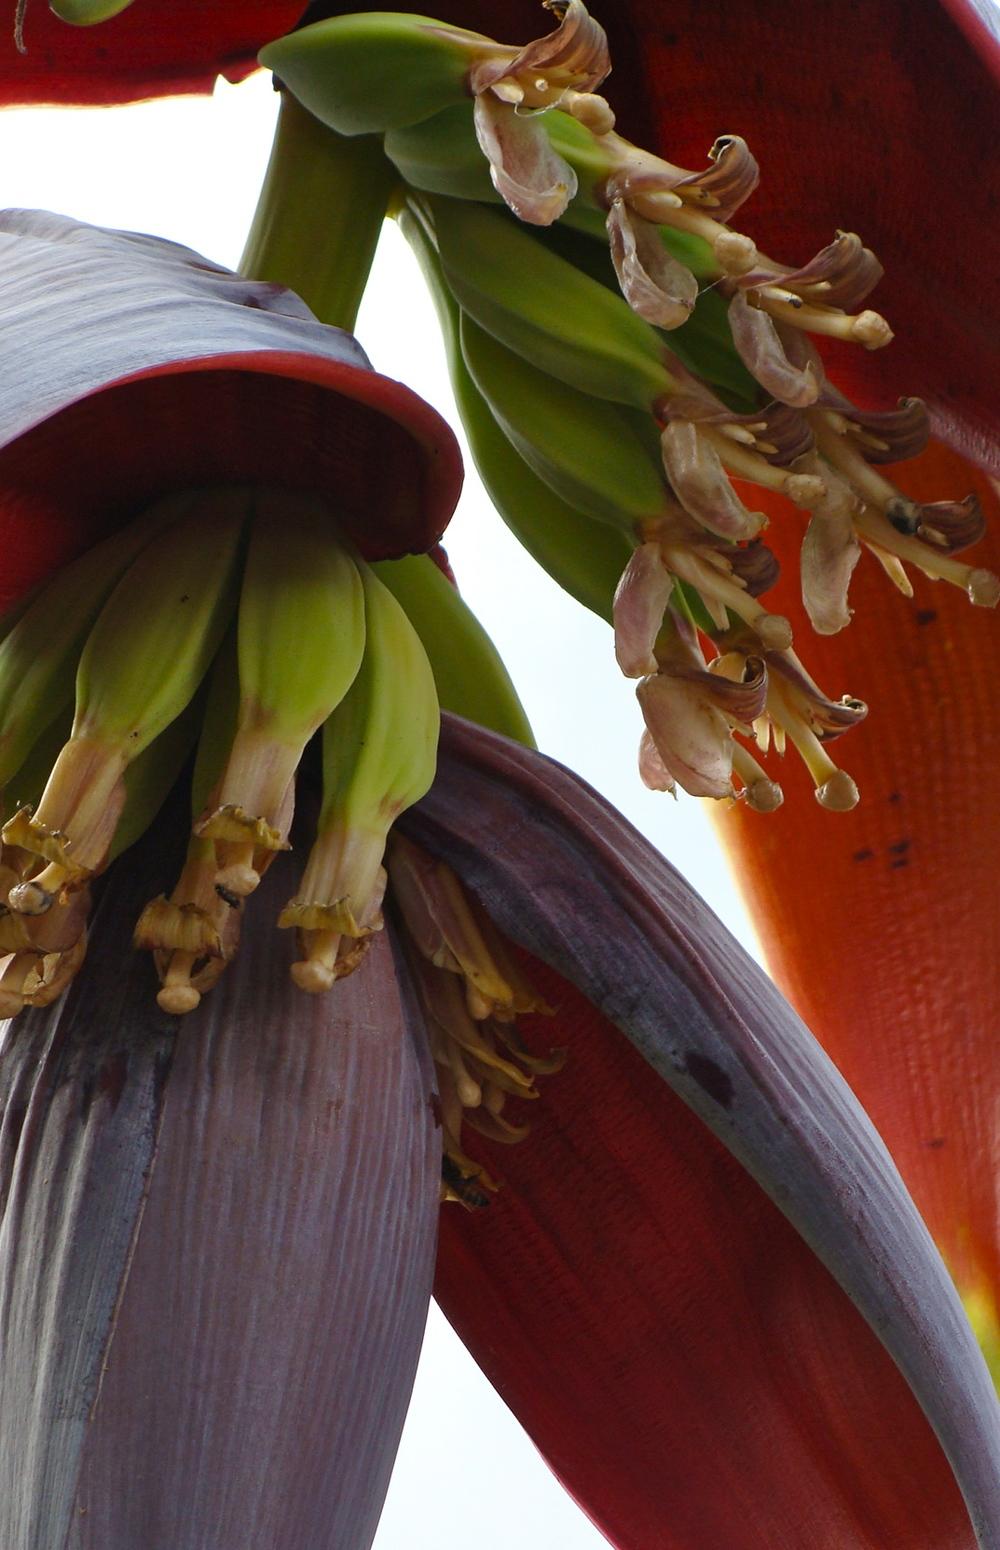 Banana Flower, Segada Philippines